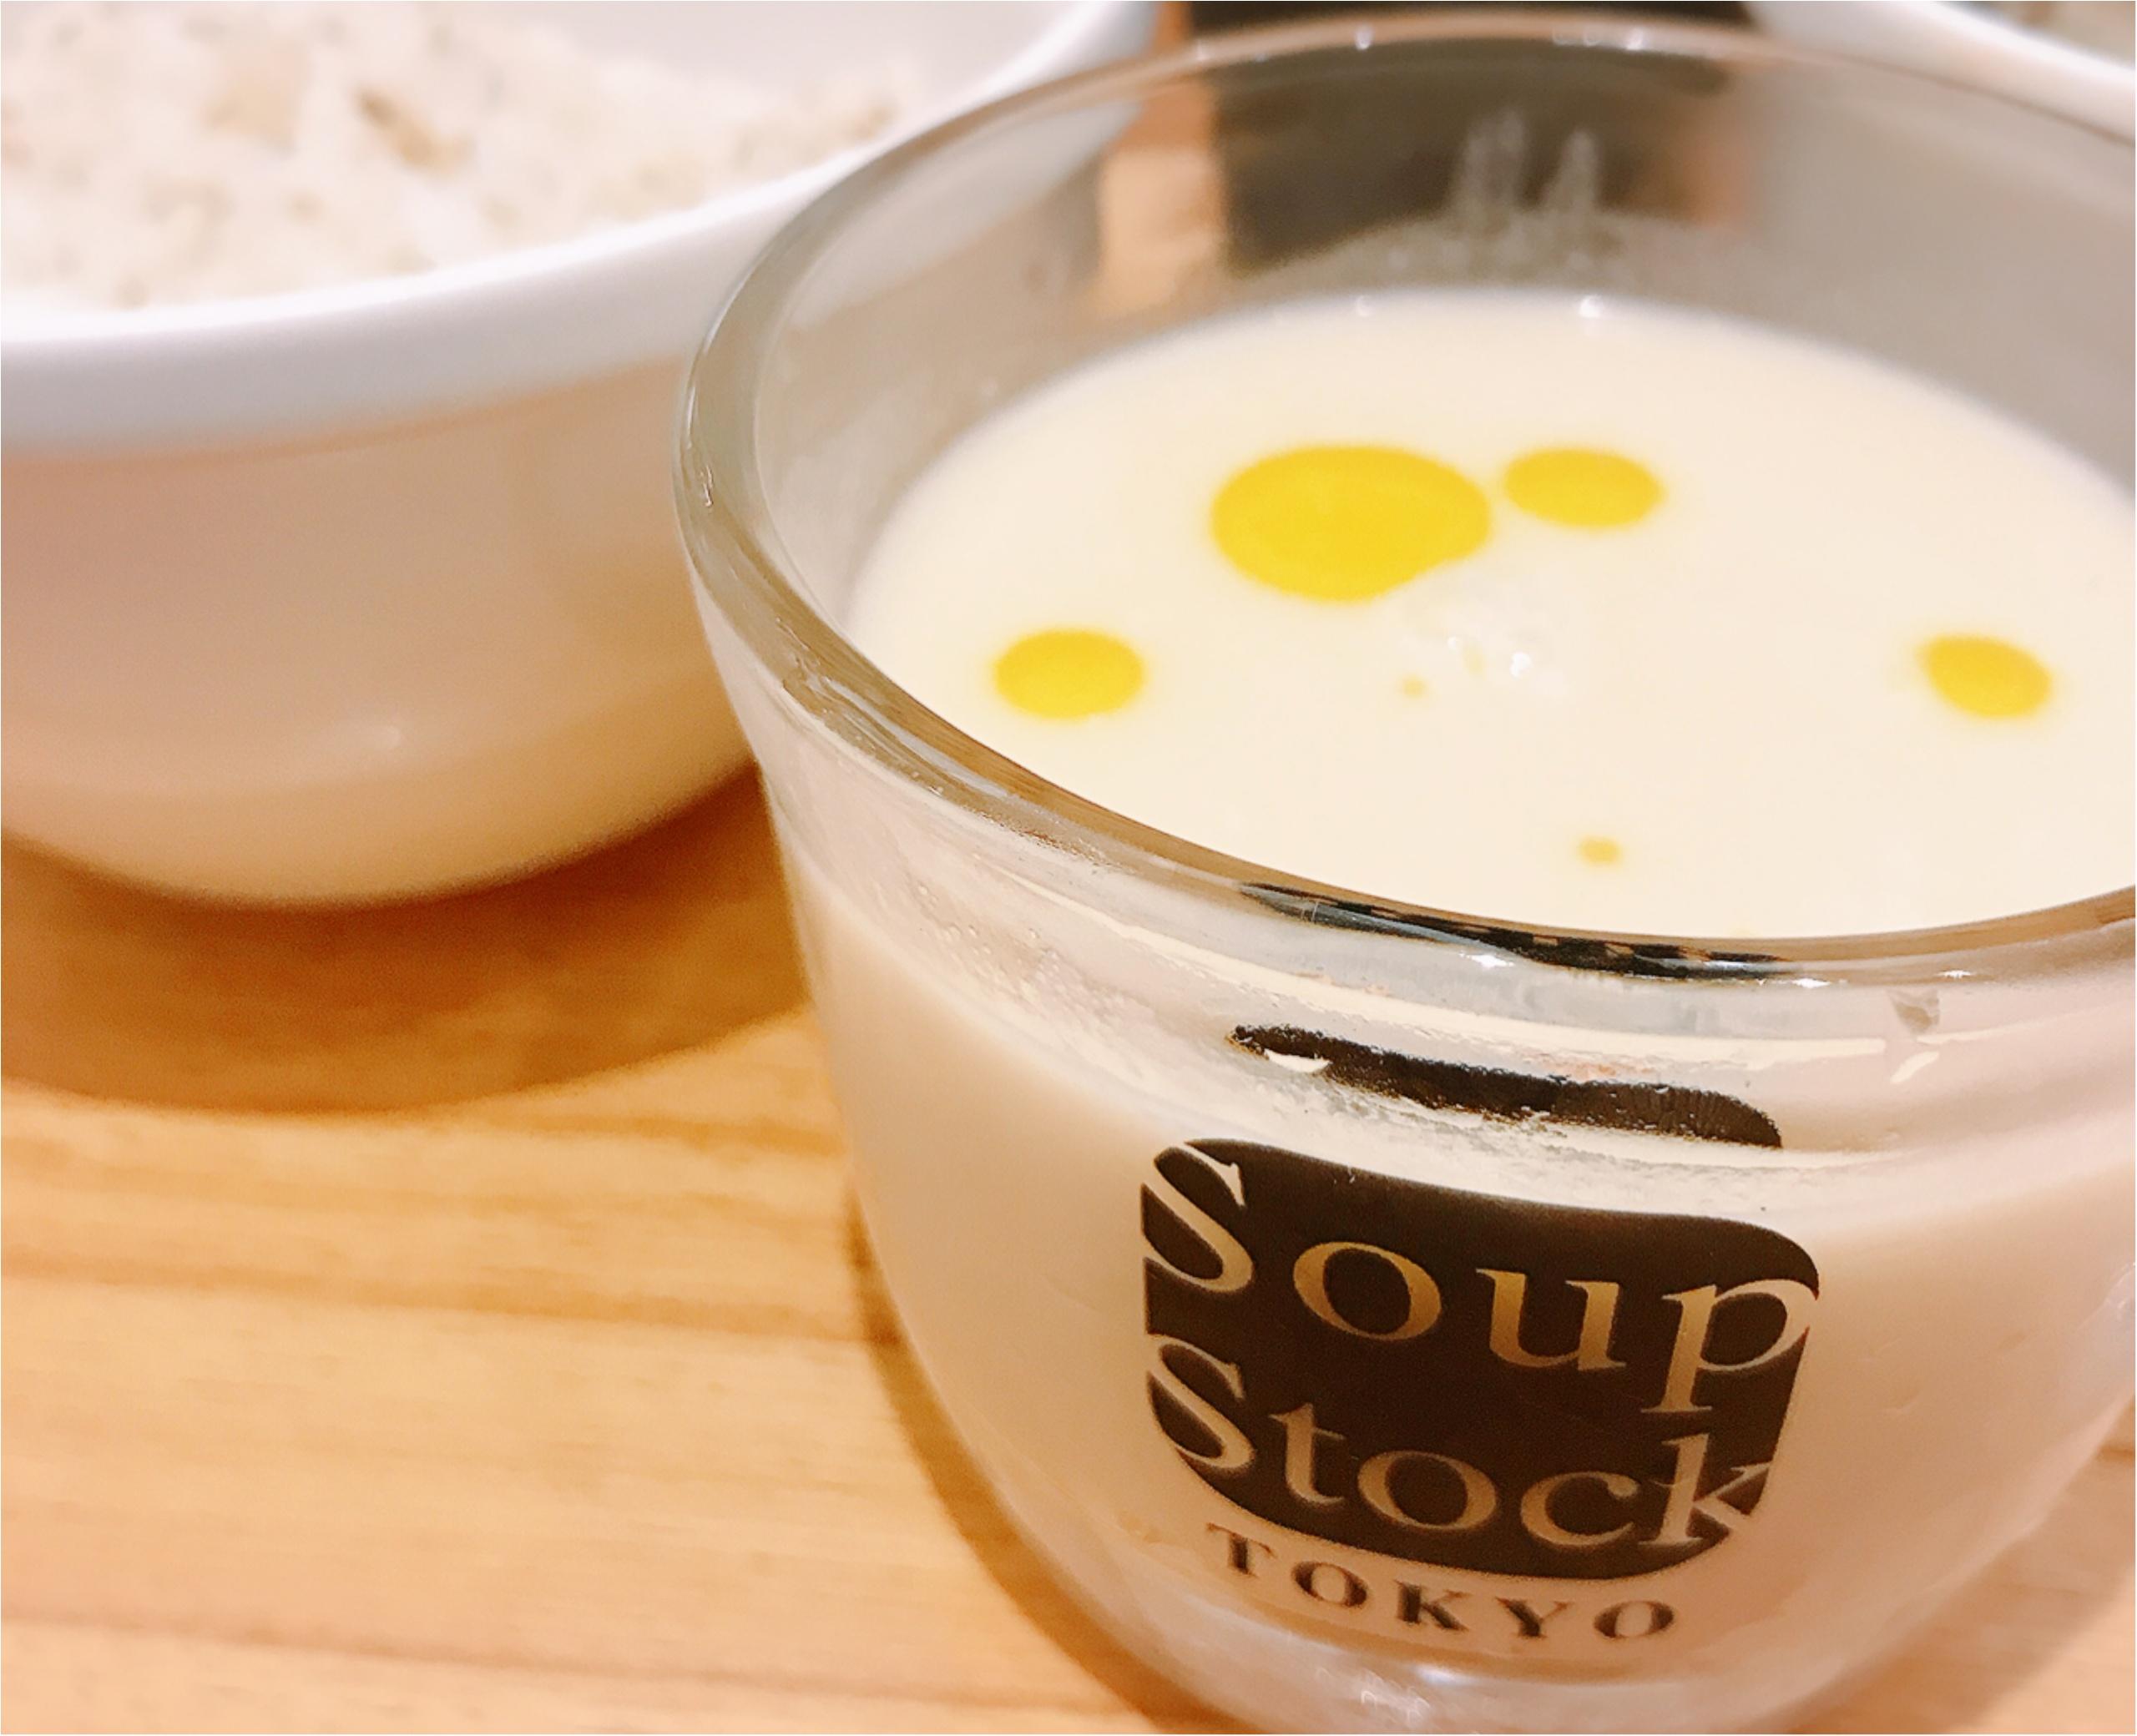 【Soup Stock Tokyo】1週間だけの限定メニュー!◯◯のポタージュが絶品♡_2